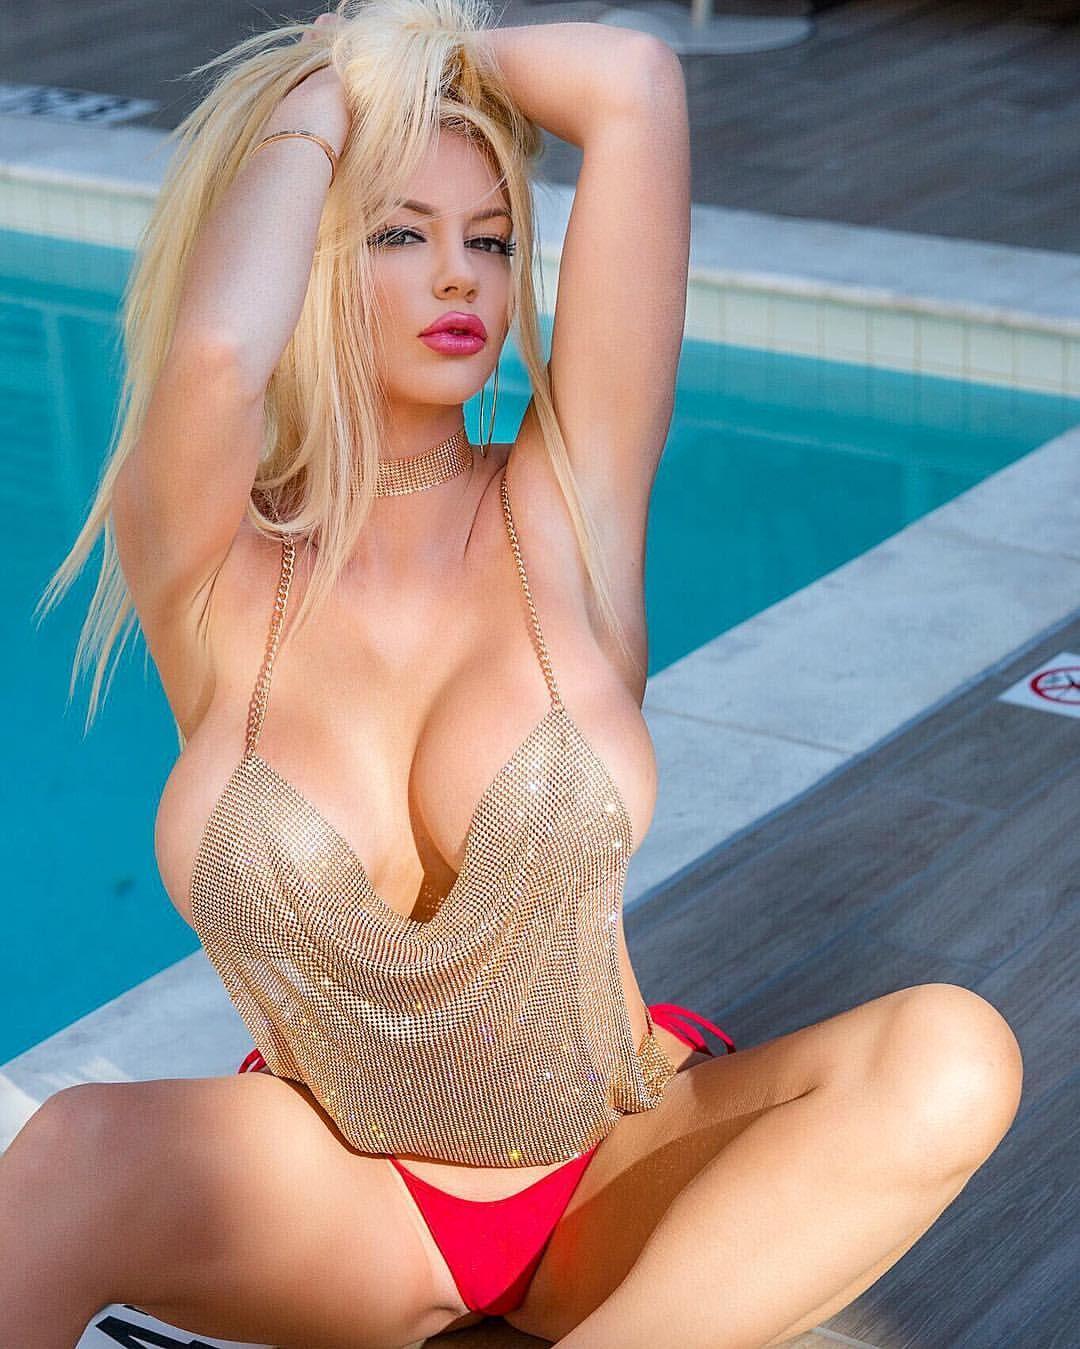 Nicolette Shea www.sexytweetdesk.com